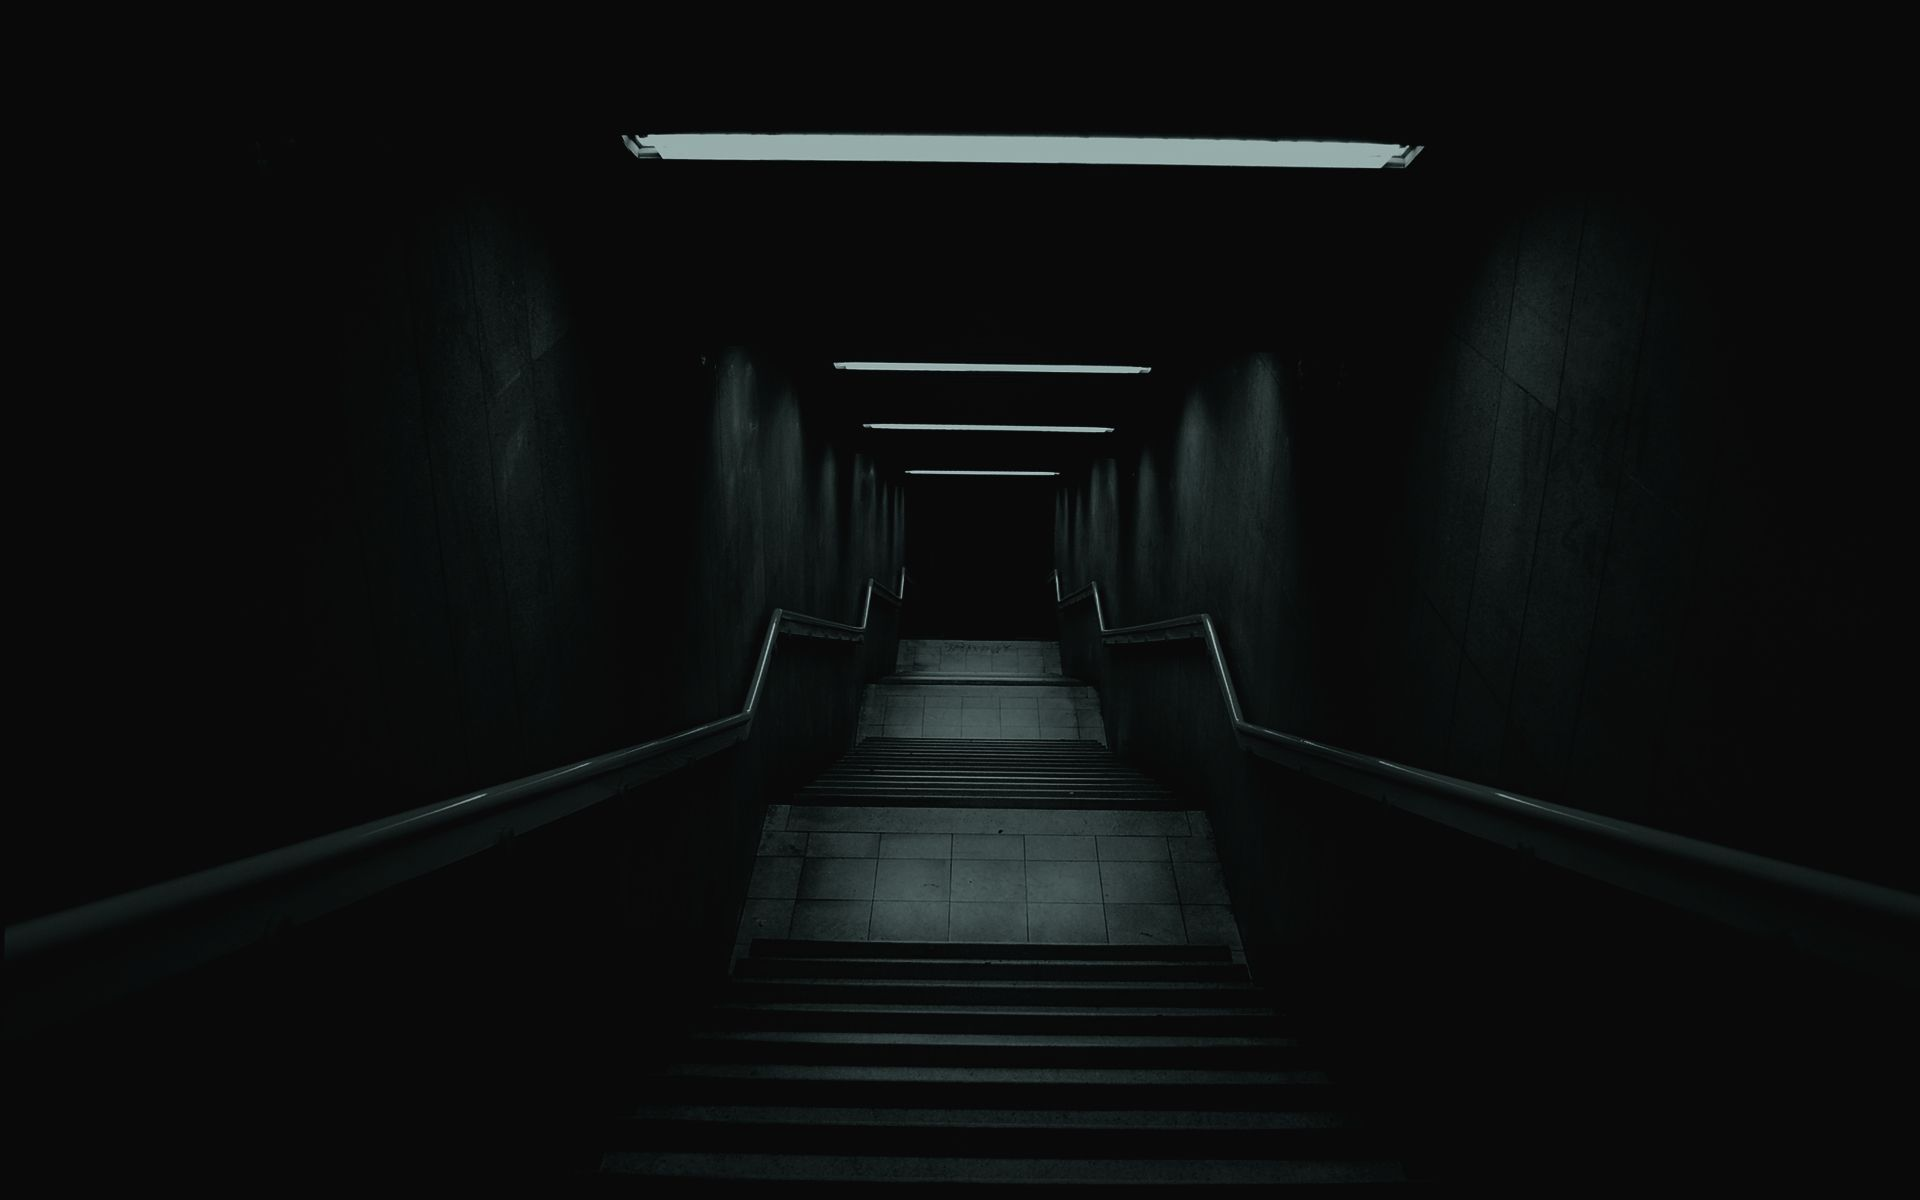 Dark Wallpapers Hd